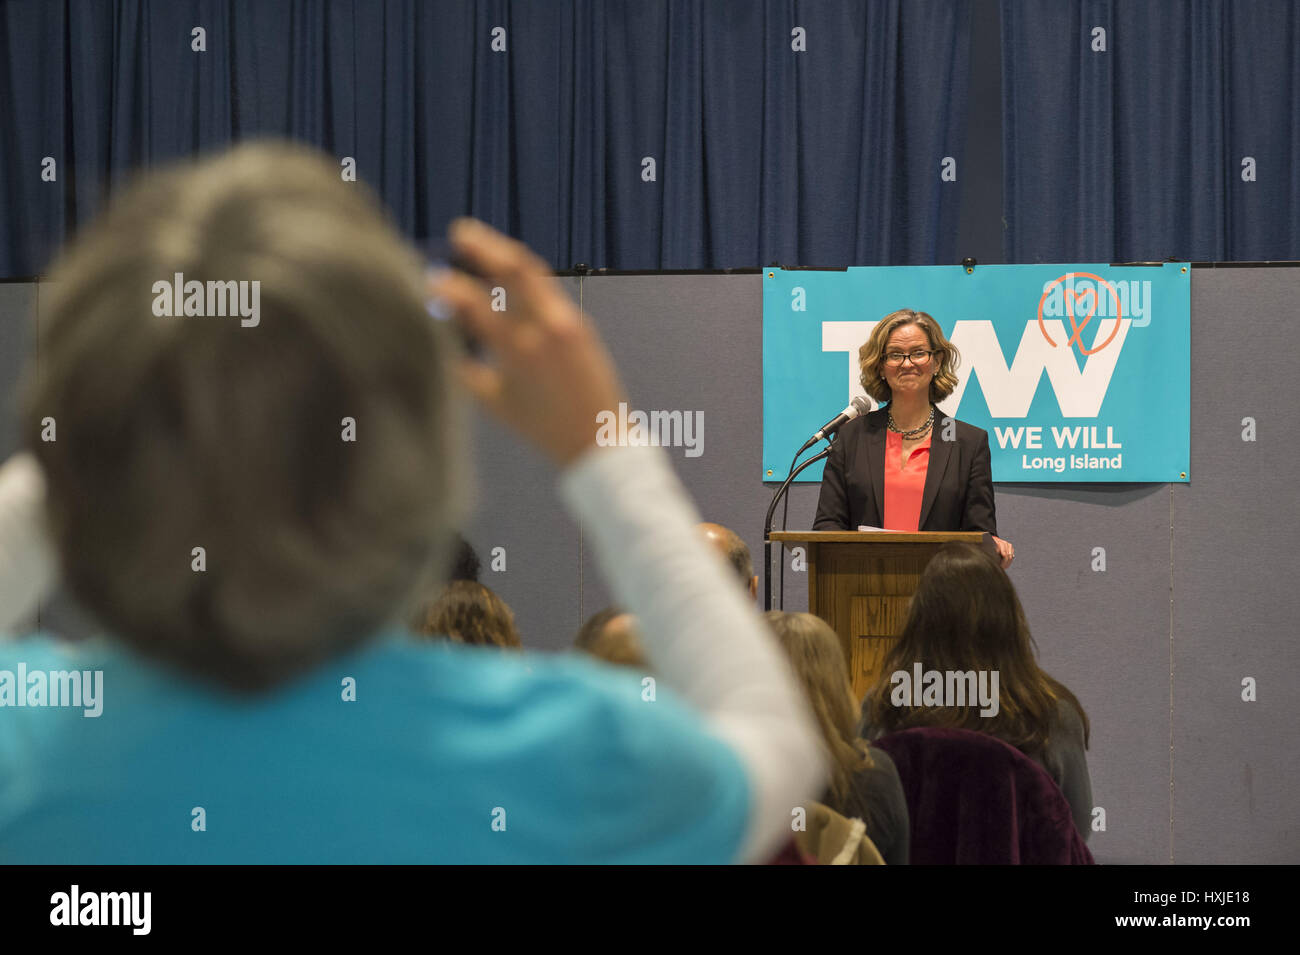 Wyandanch, New York, USA. 26th Mar, 2017. At podium, LAURA CURRAN, Nassau County Legislator (Dem - District 5) speaks - Stock Image